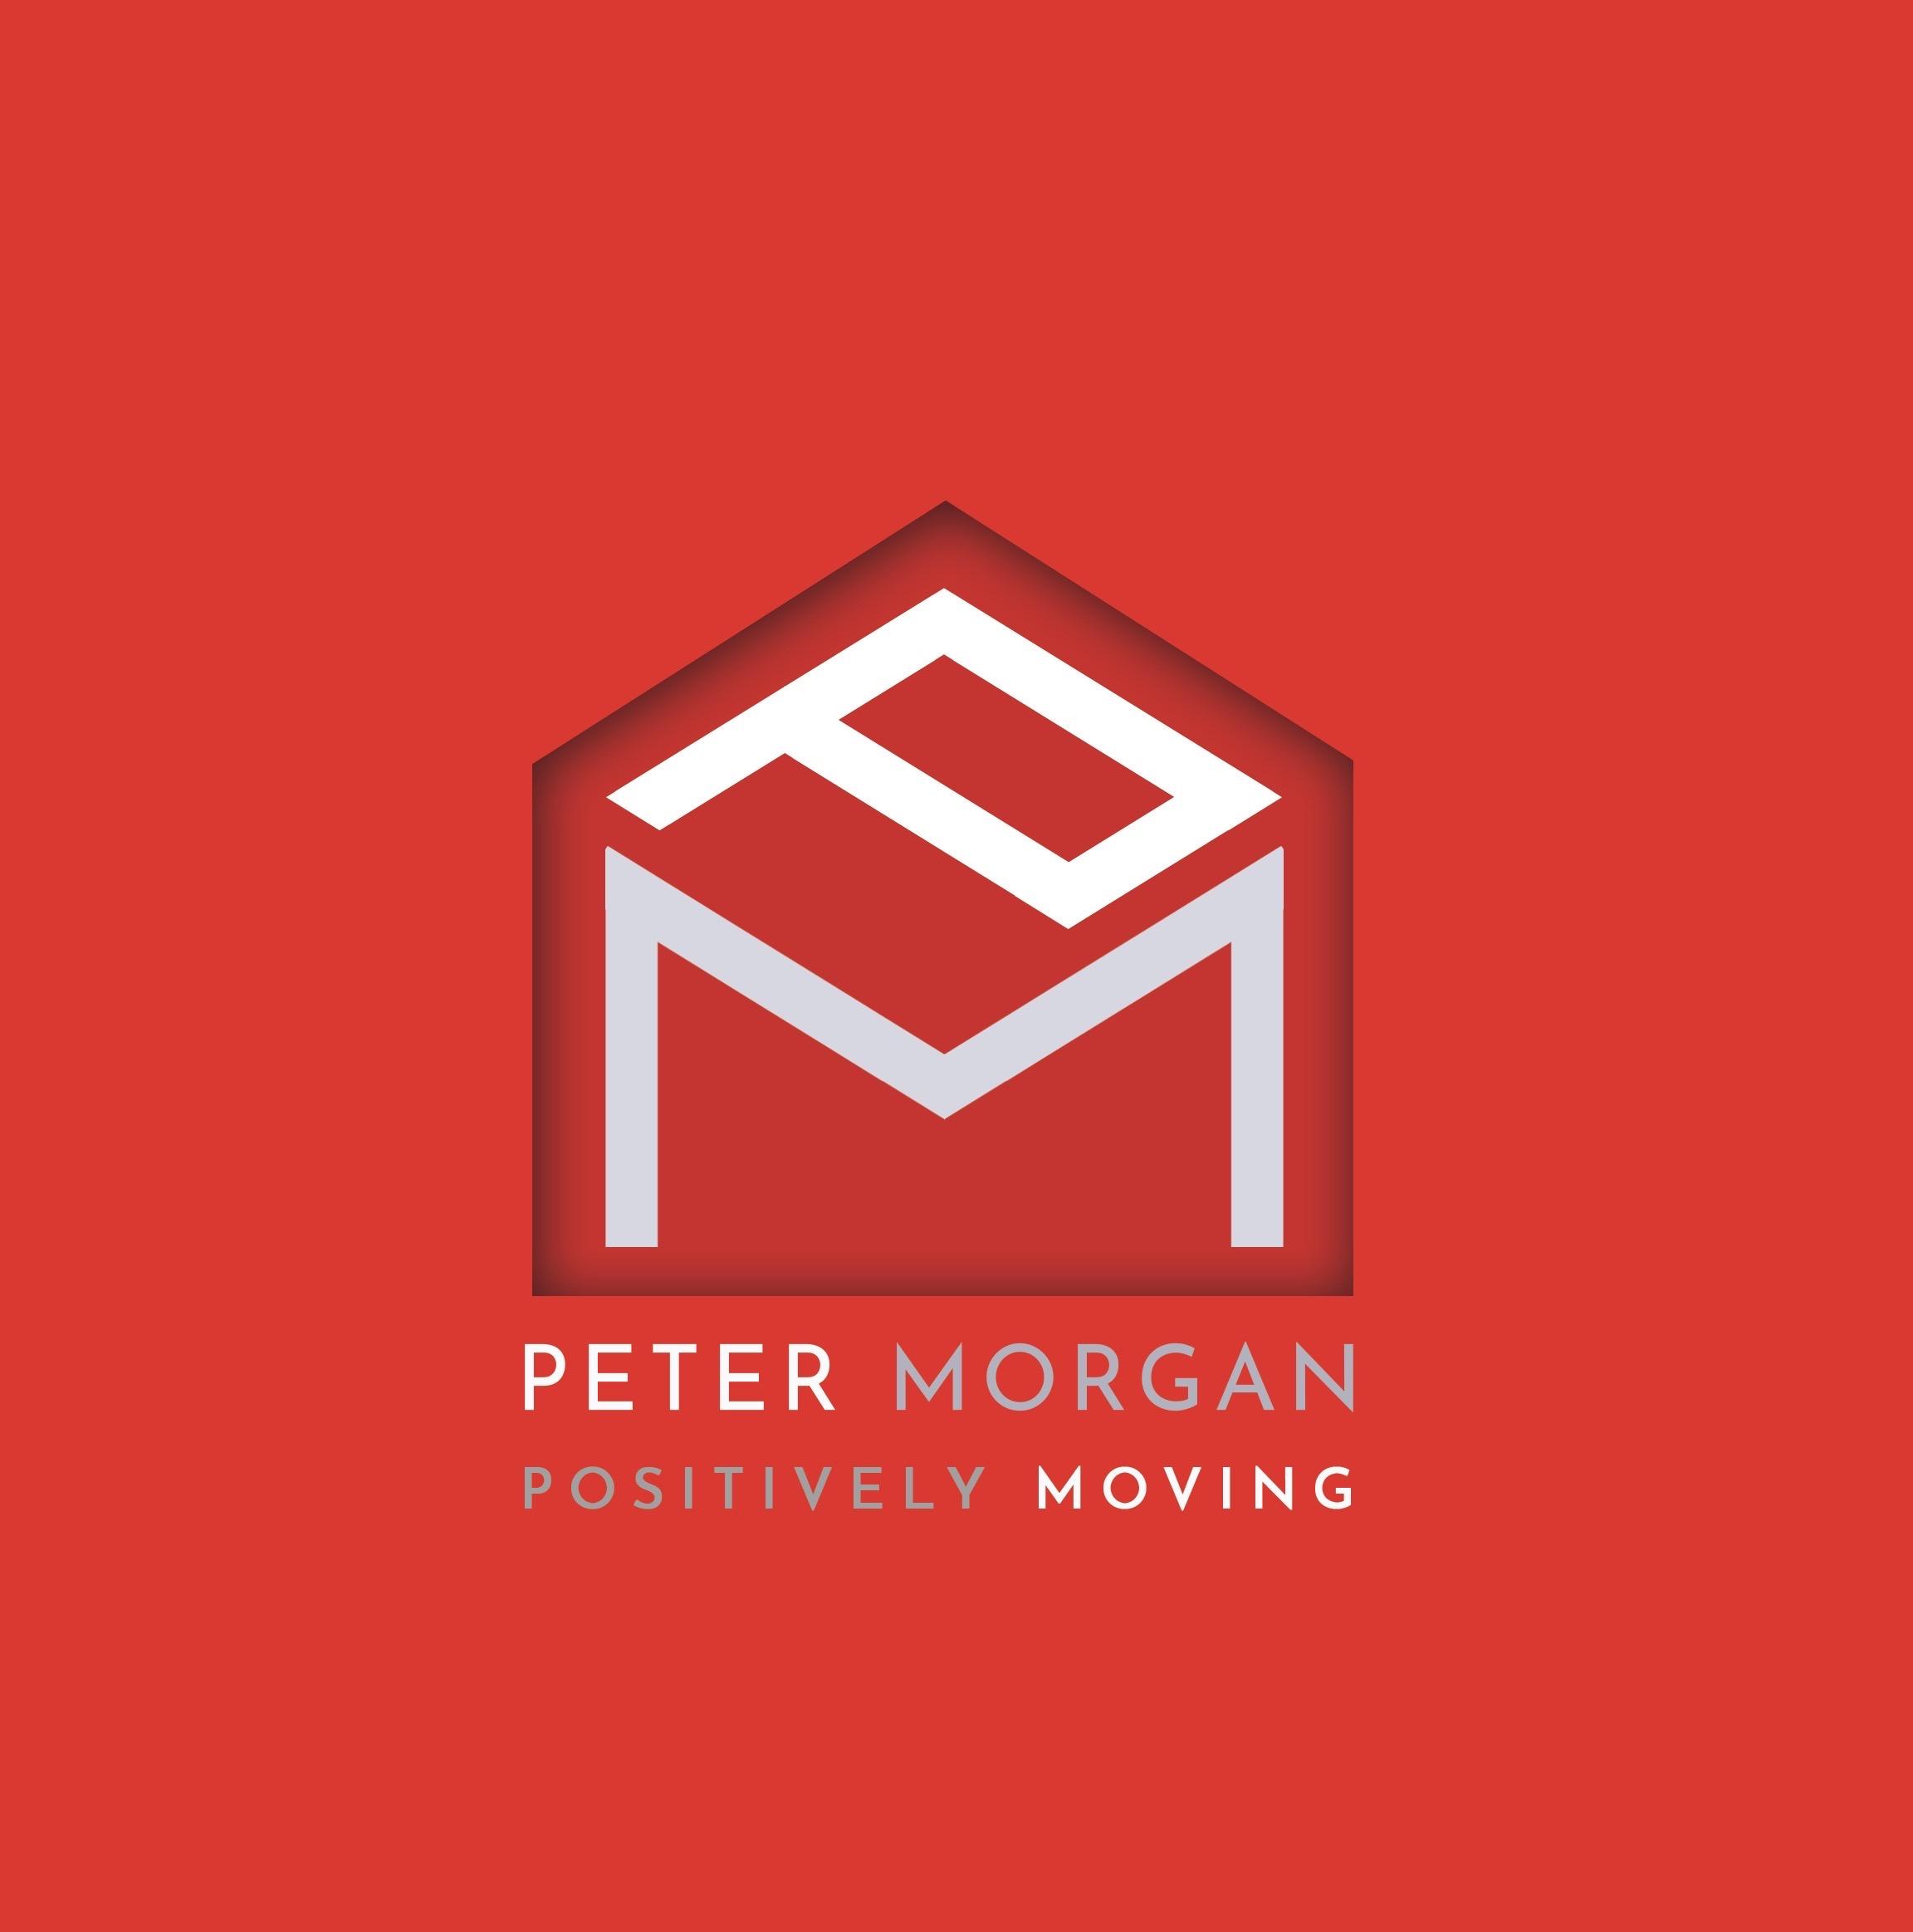 Peter Morgan Estate Agents - Neath Sales & Lettings